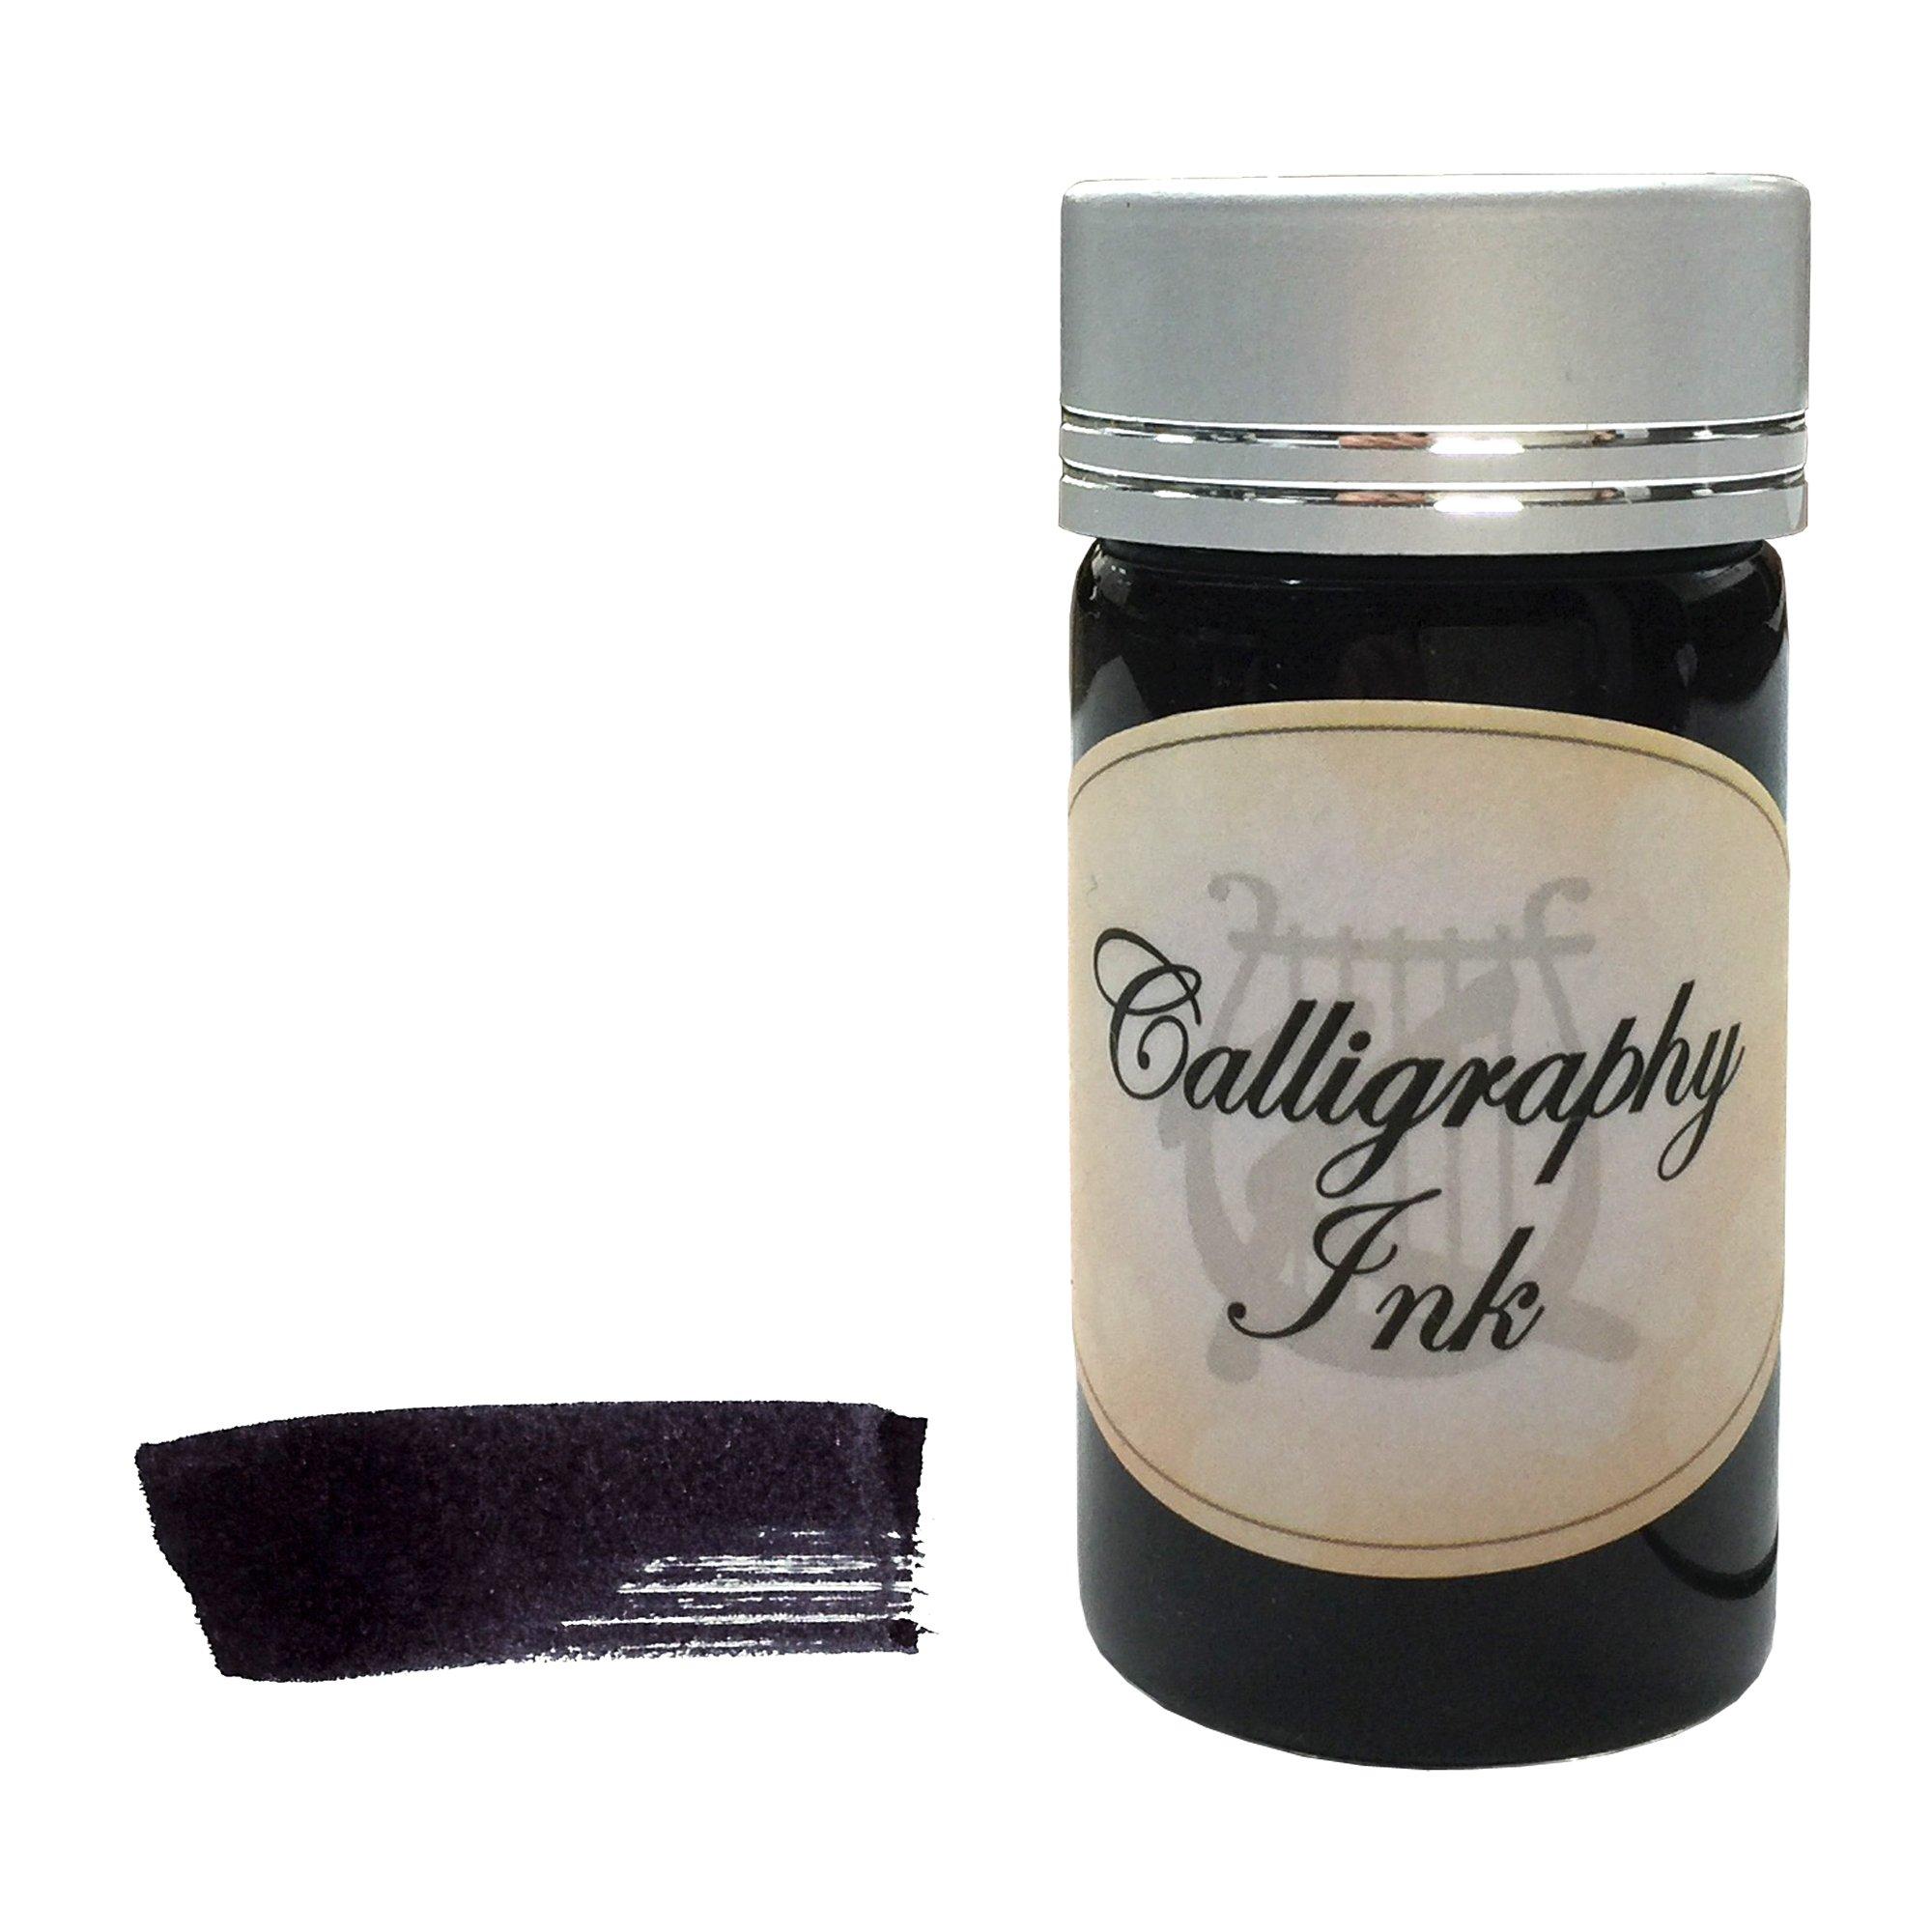 Kentaur Standard Bottle Ink Set - 25 ml (5 Color) - For Fountain Pens, Dips Pens, Ink Refills, and Calligraphy by Kentaur (Image #3)